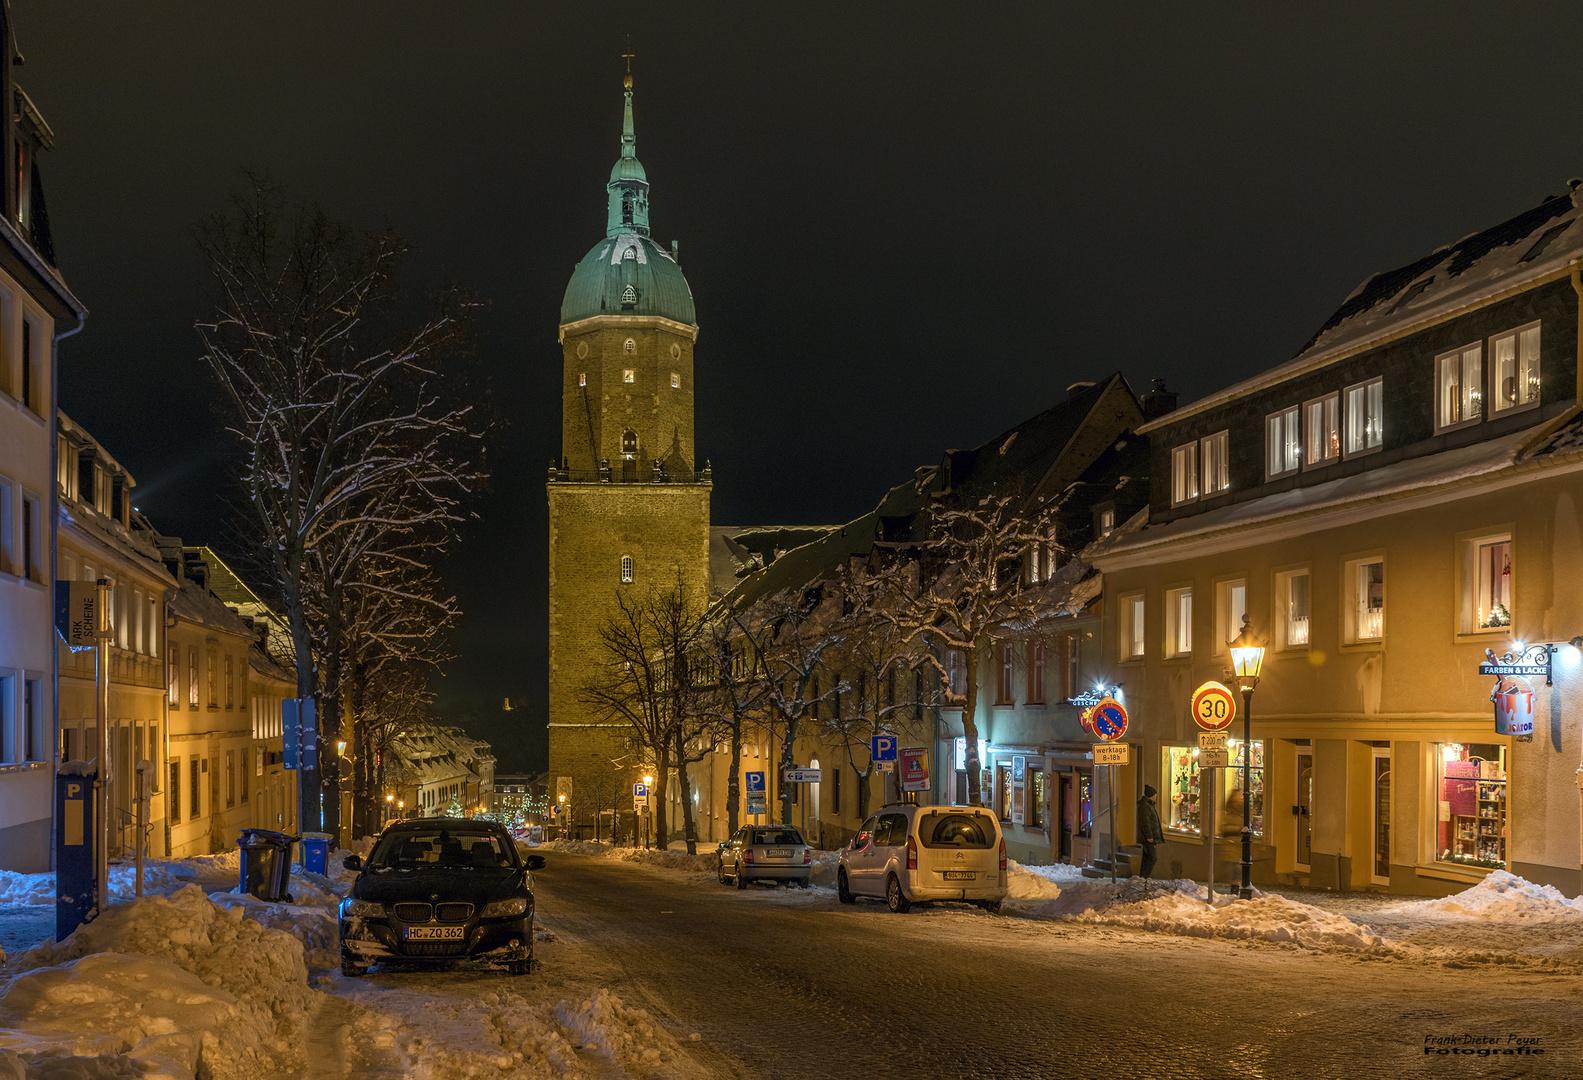 Wintertime in Annaberg-Buchholz